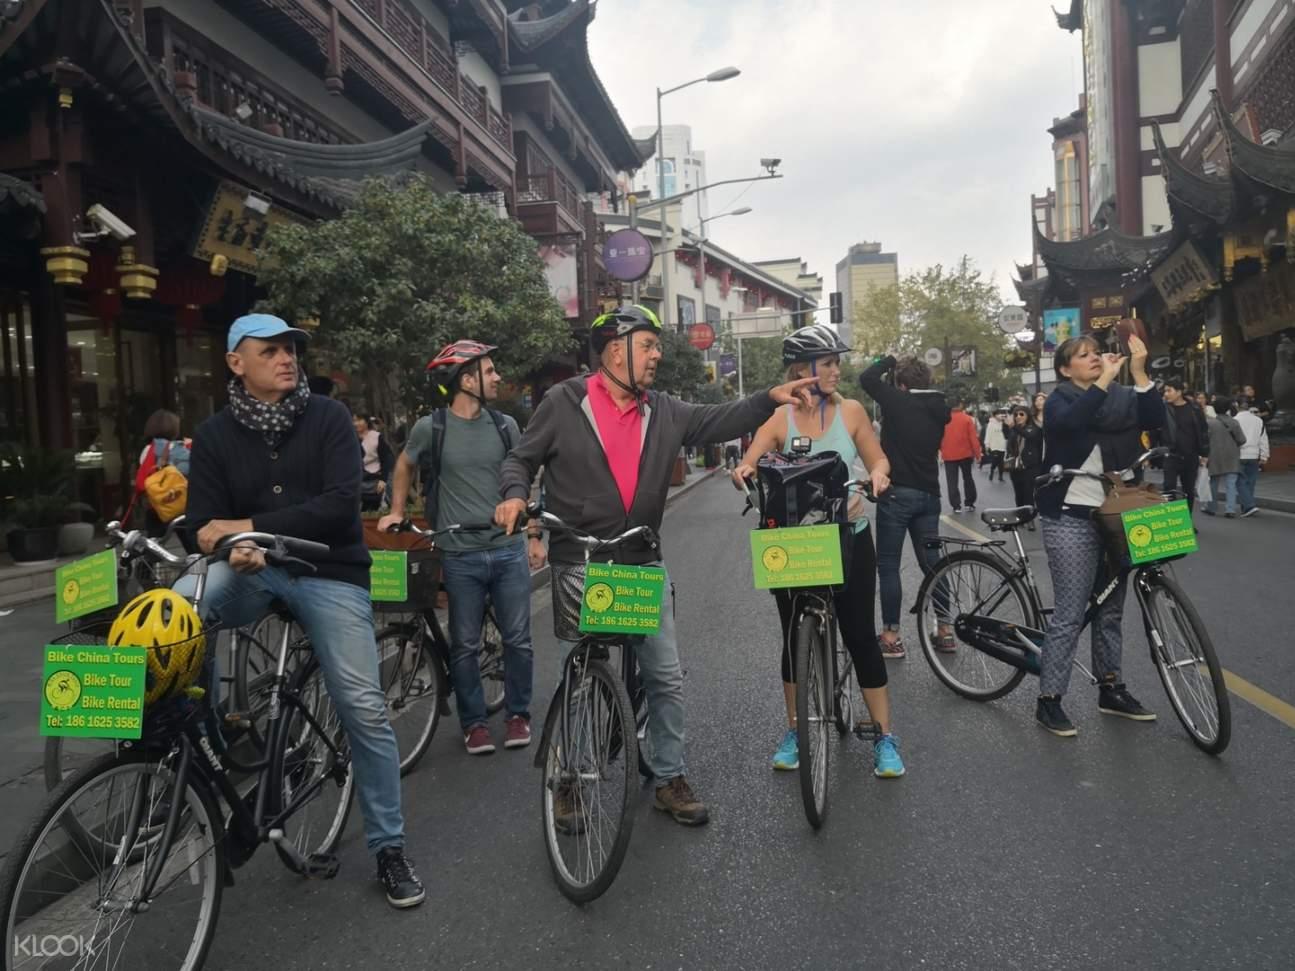 group of tourists biking in shanghai